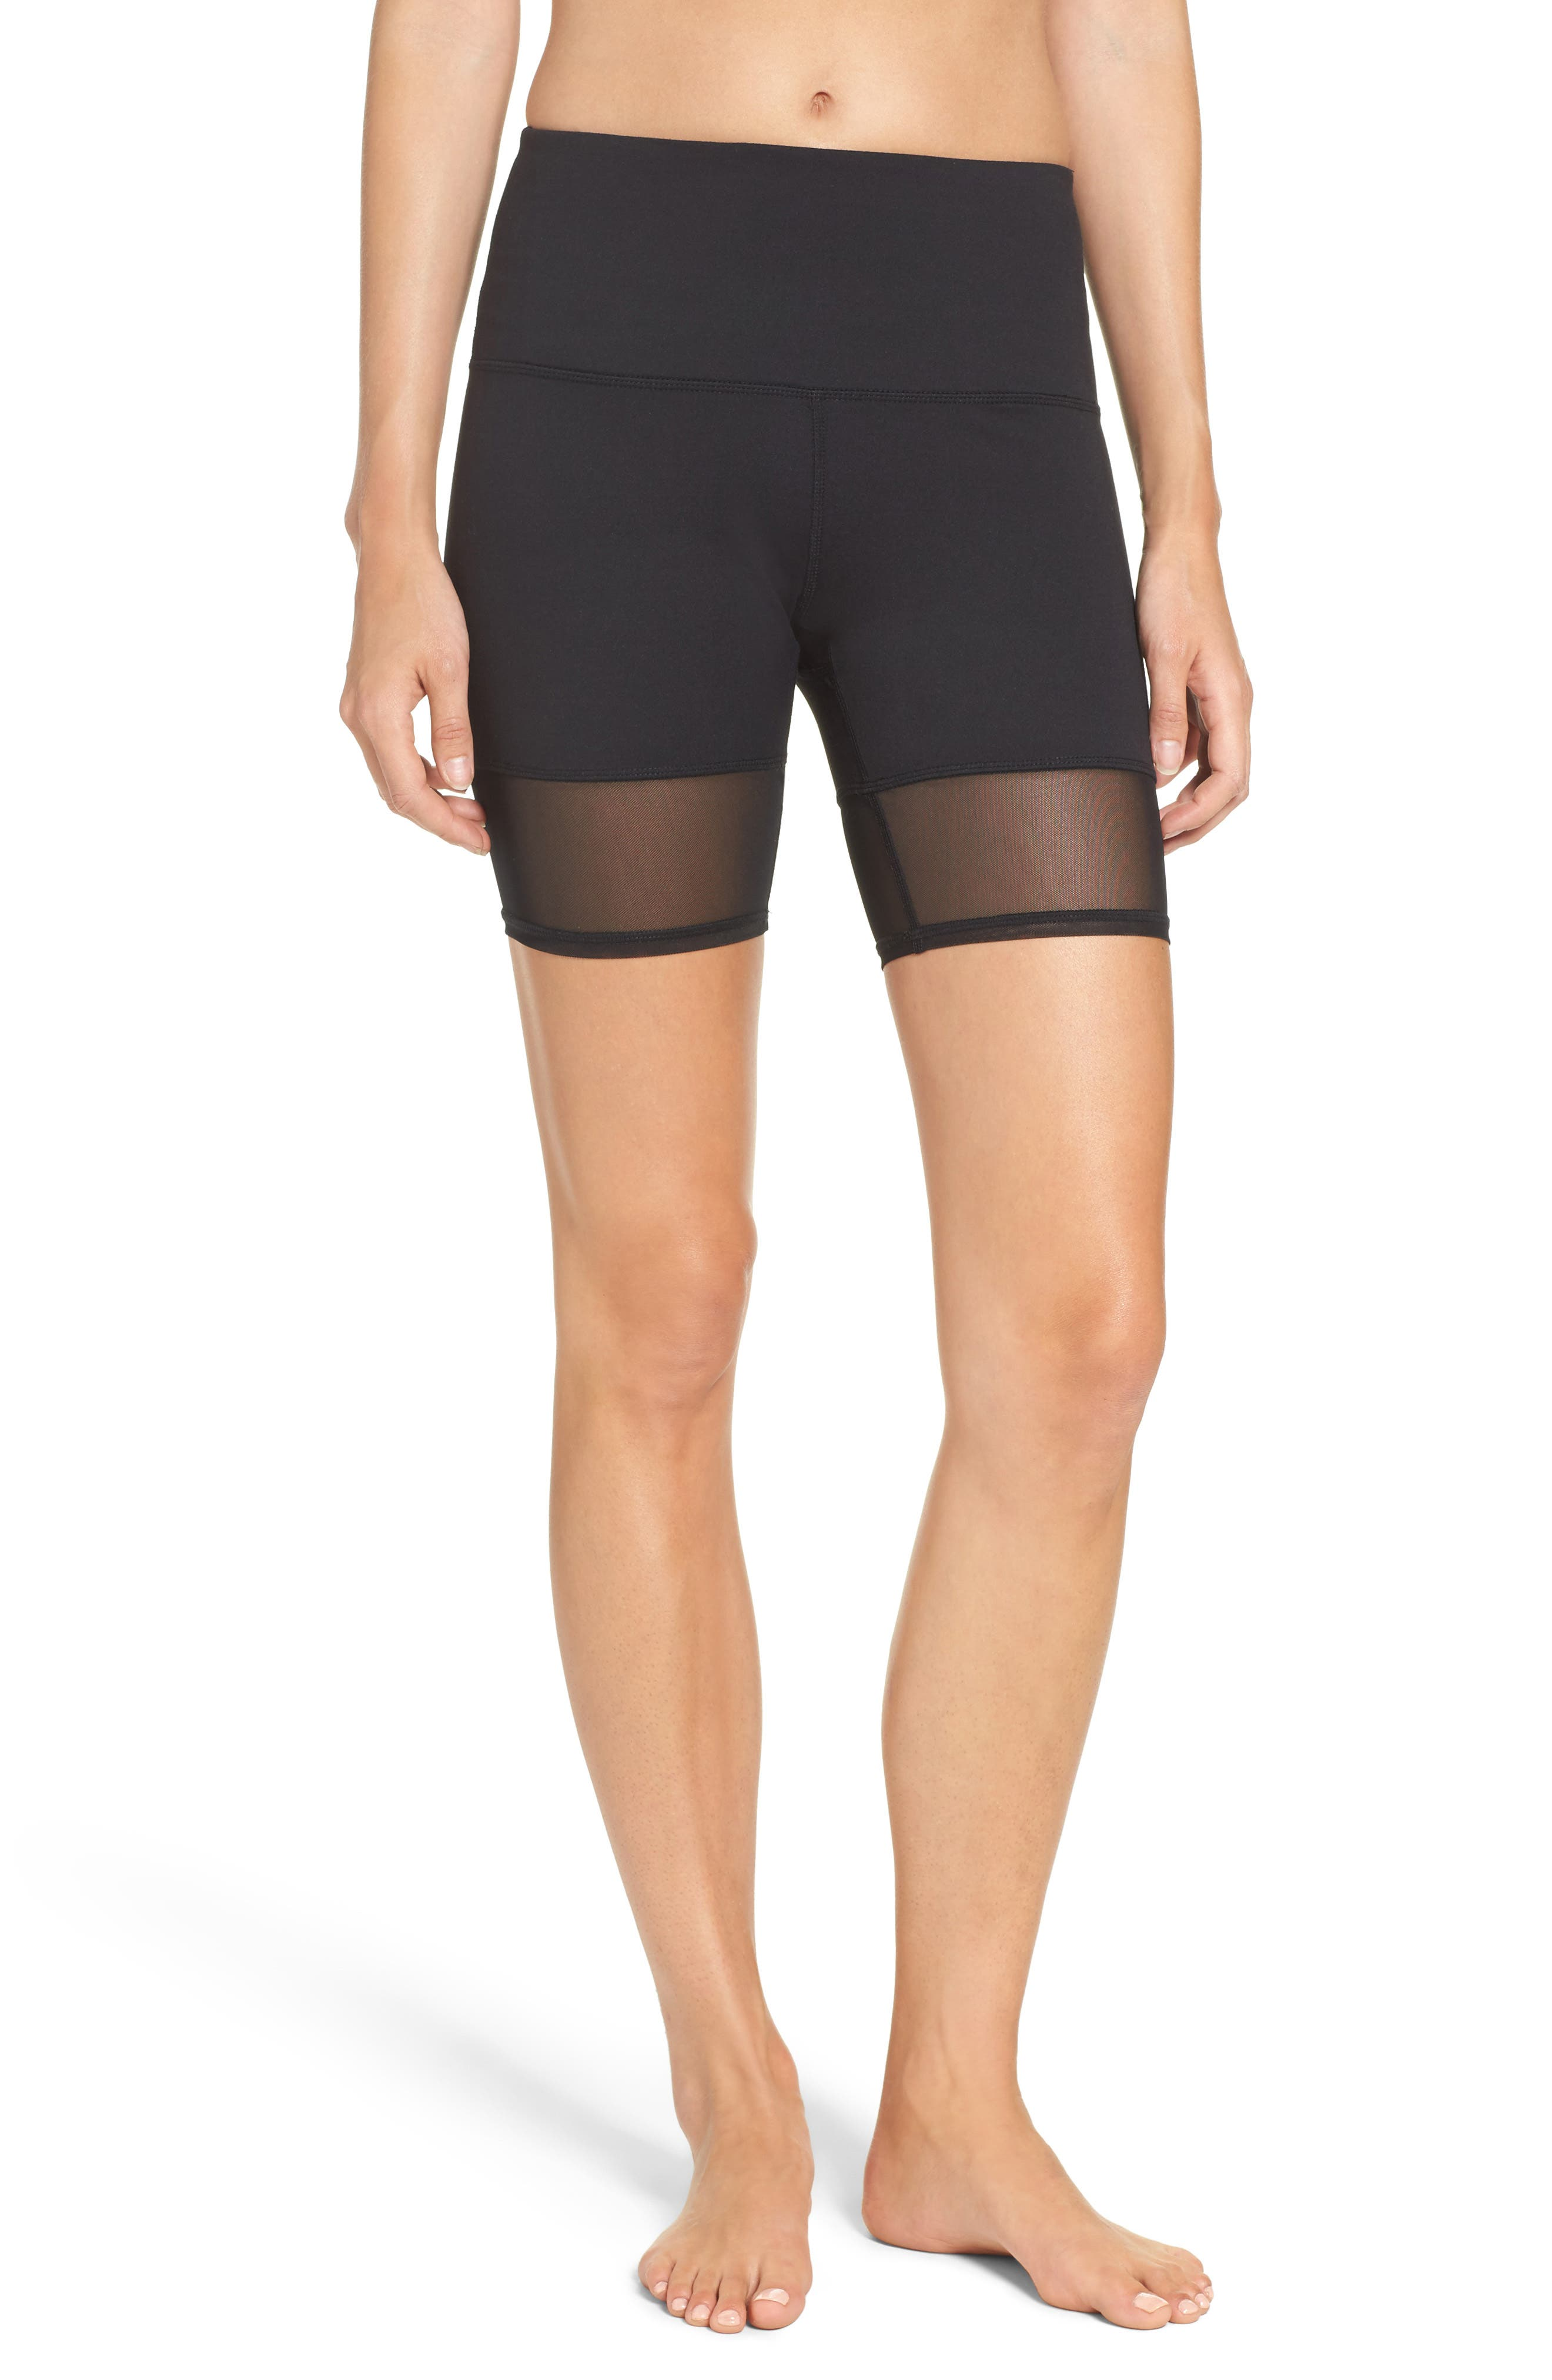 Mia High Waist Mesh Bike Shorts,                             Main thumbnail 1, color,                             Black